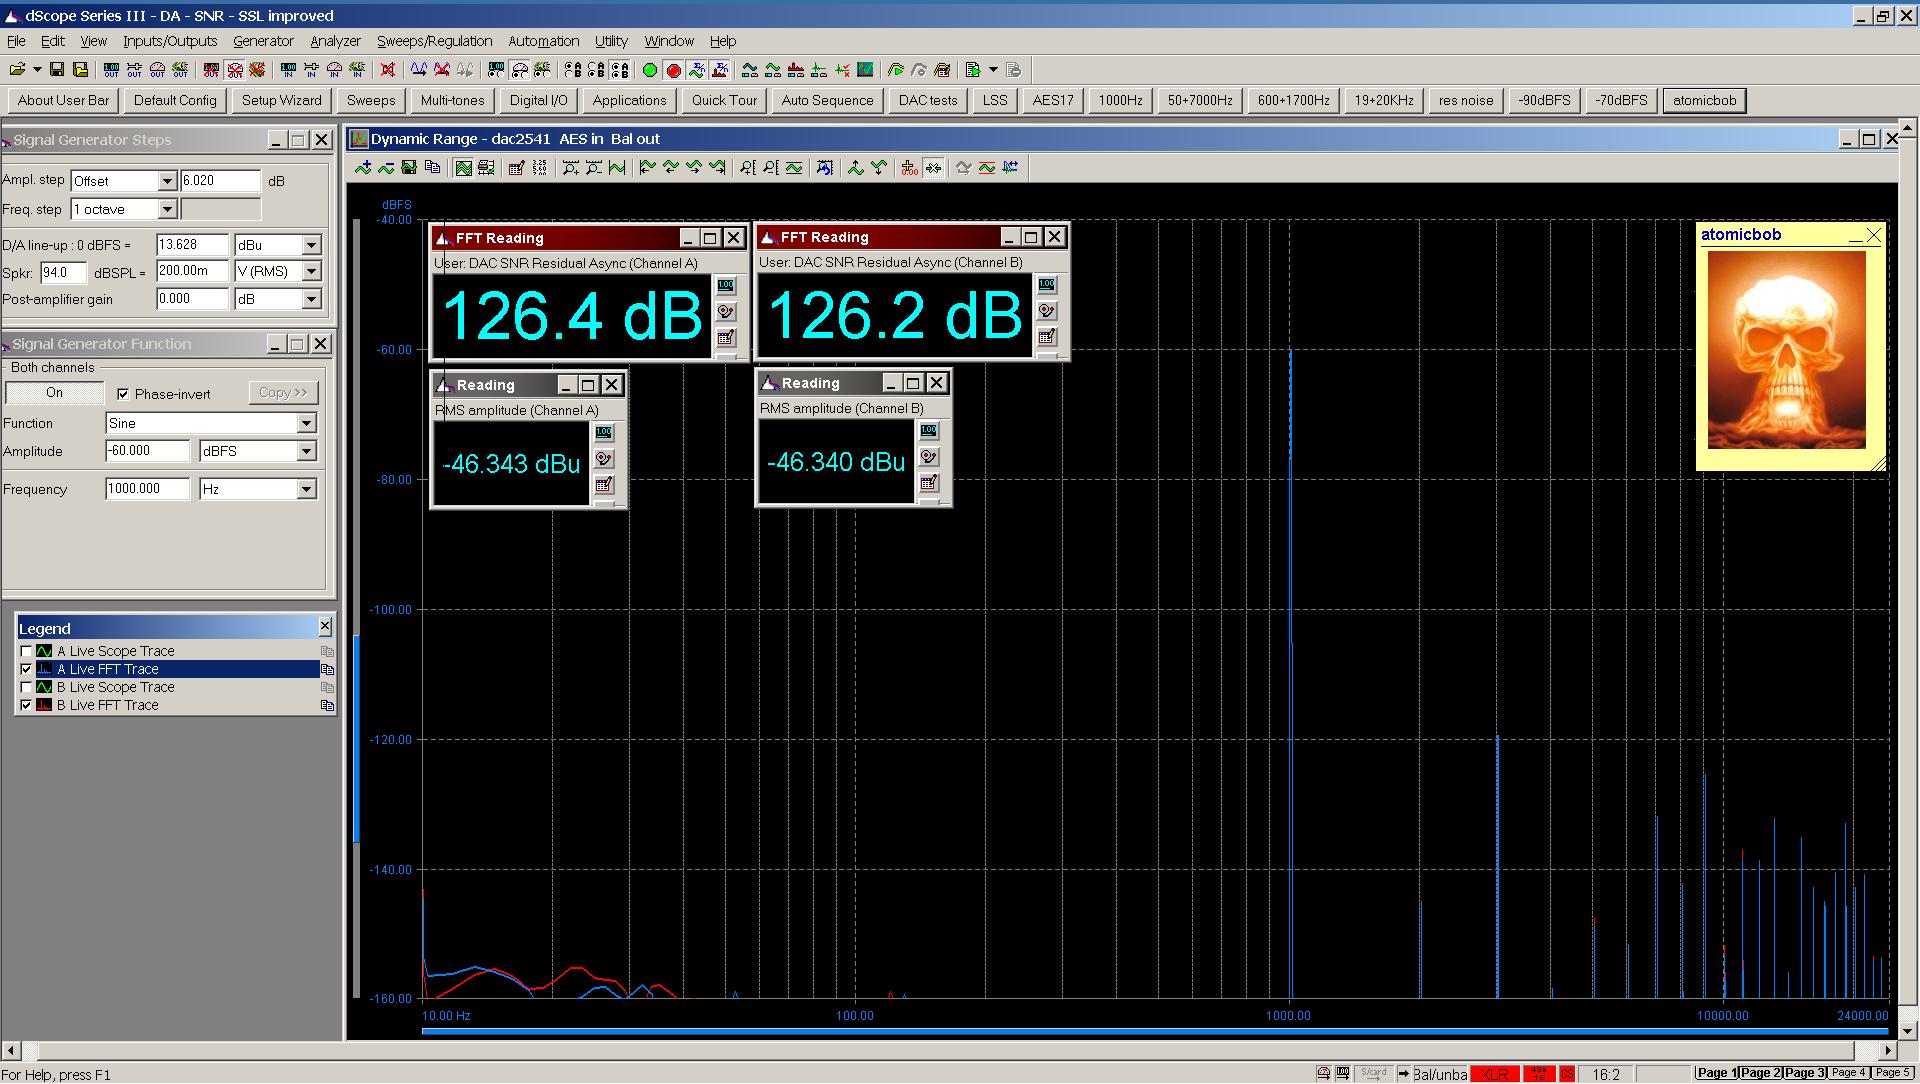 01 20210103 dac2541 dynamic range FFT AES Bal watermarked.png